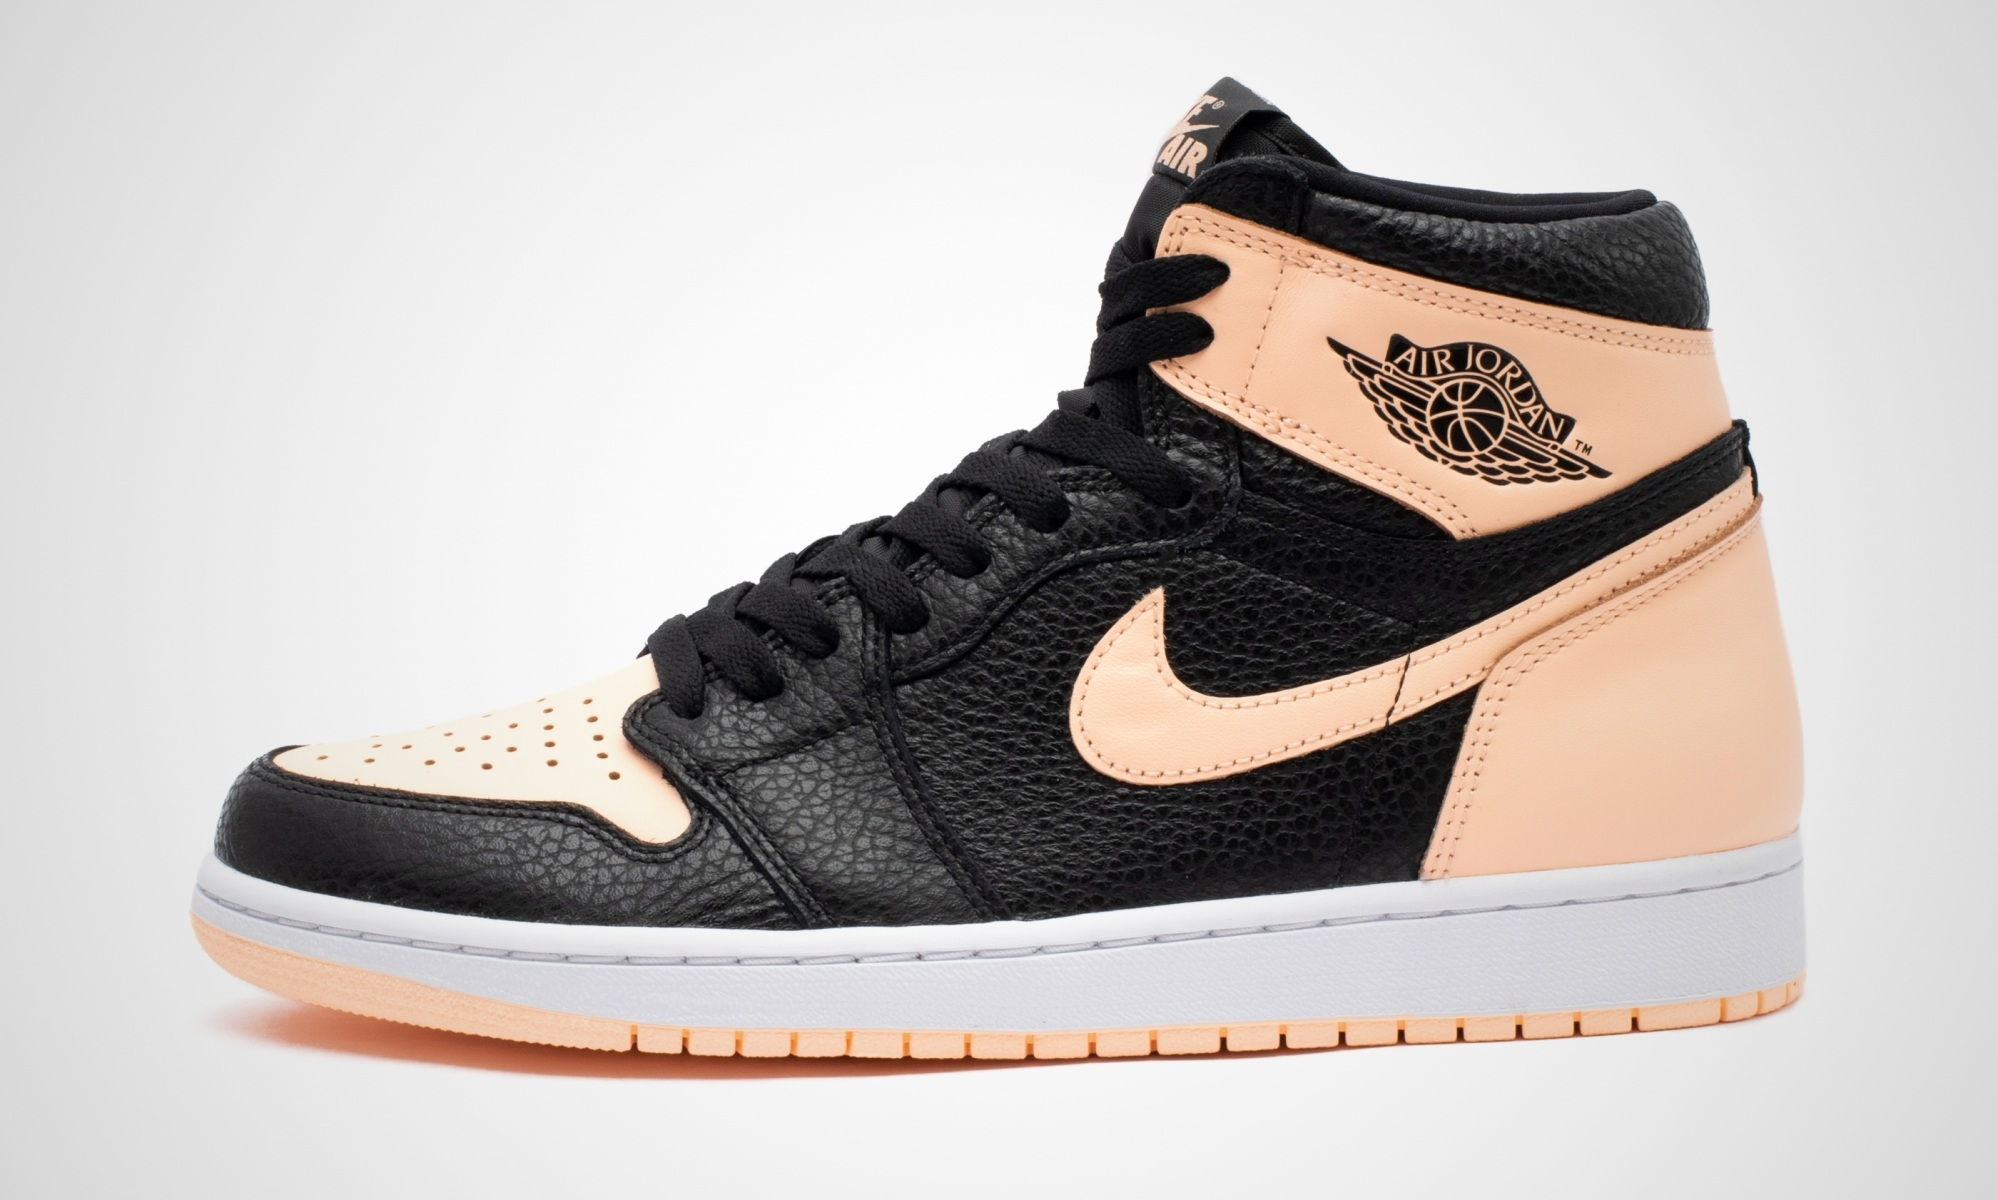 Nike Air Jordan 1 Crimson Tint